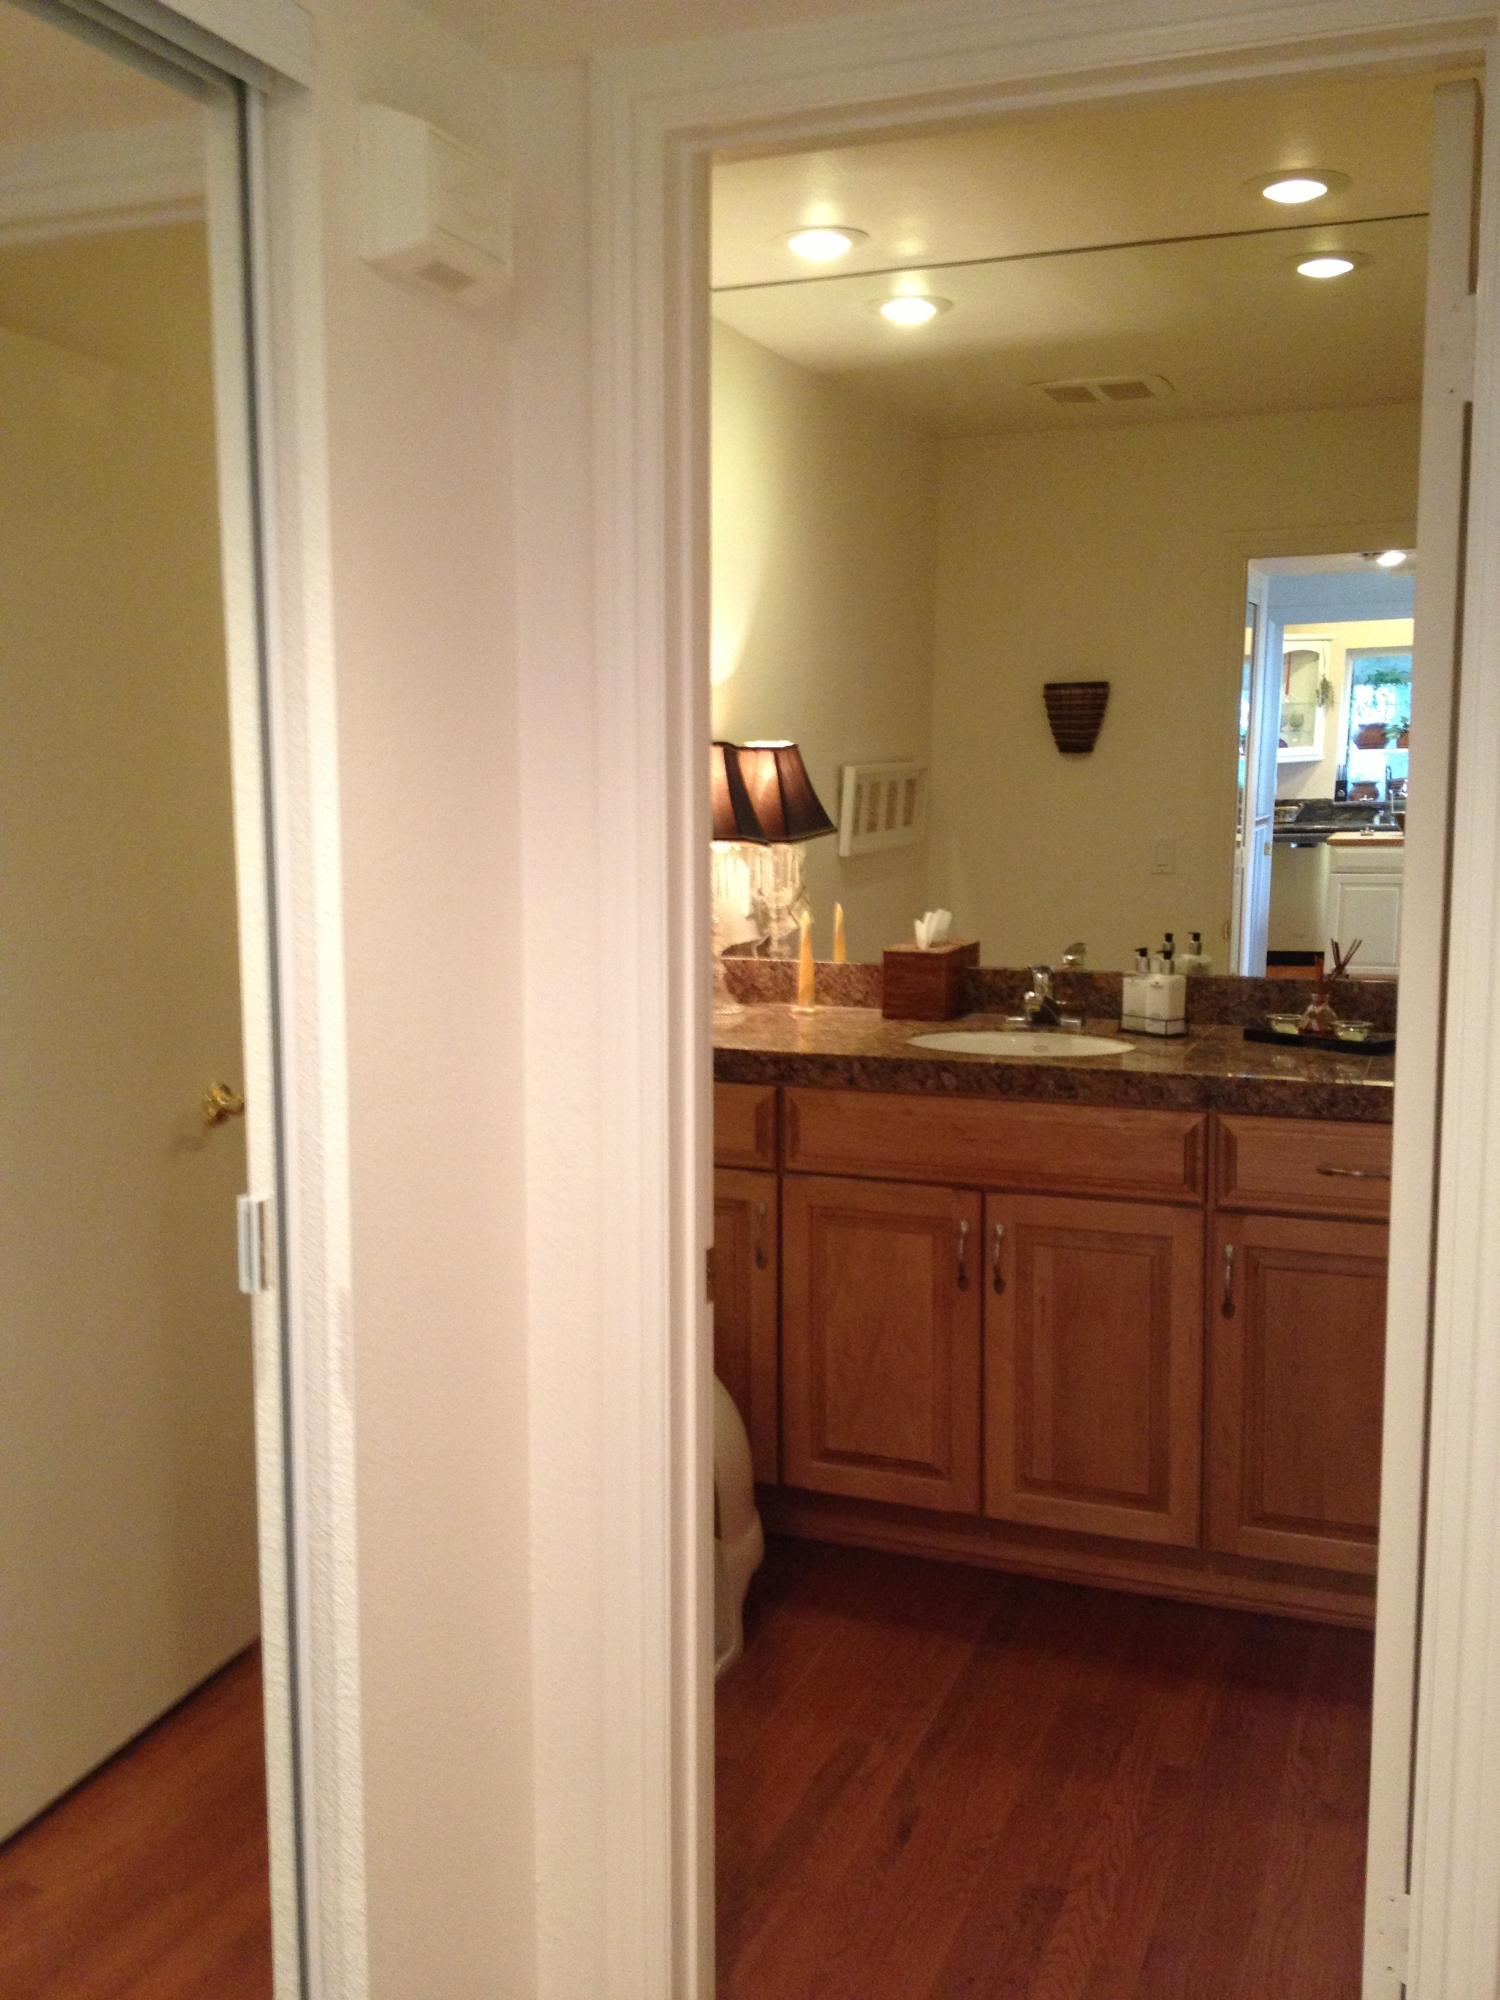 Property photo for 805 Via Granada Santa Barbara, California 93103 - 13-2031